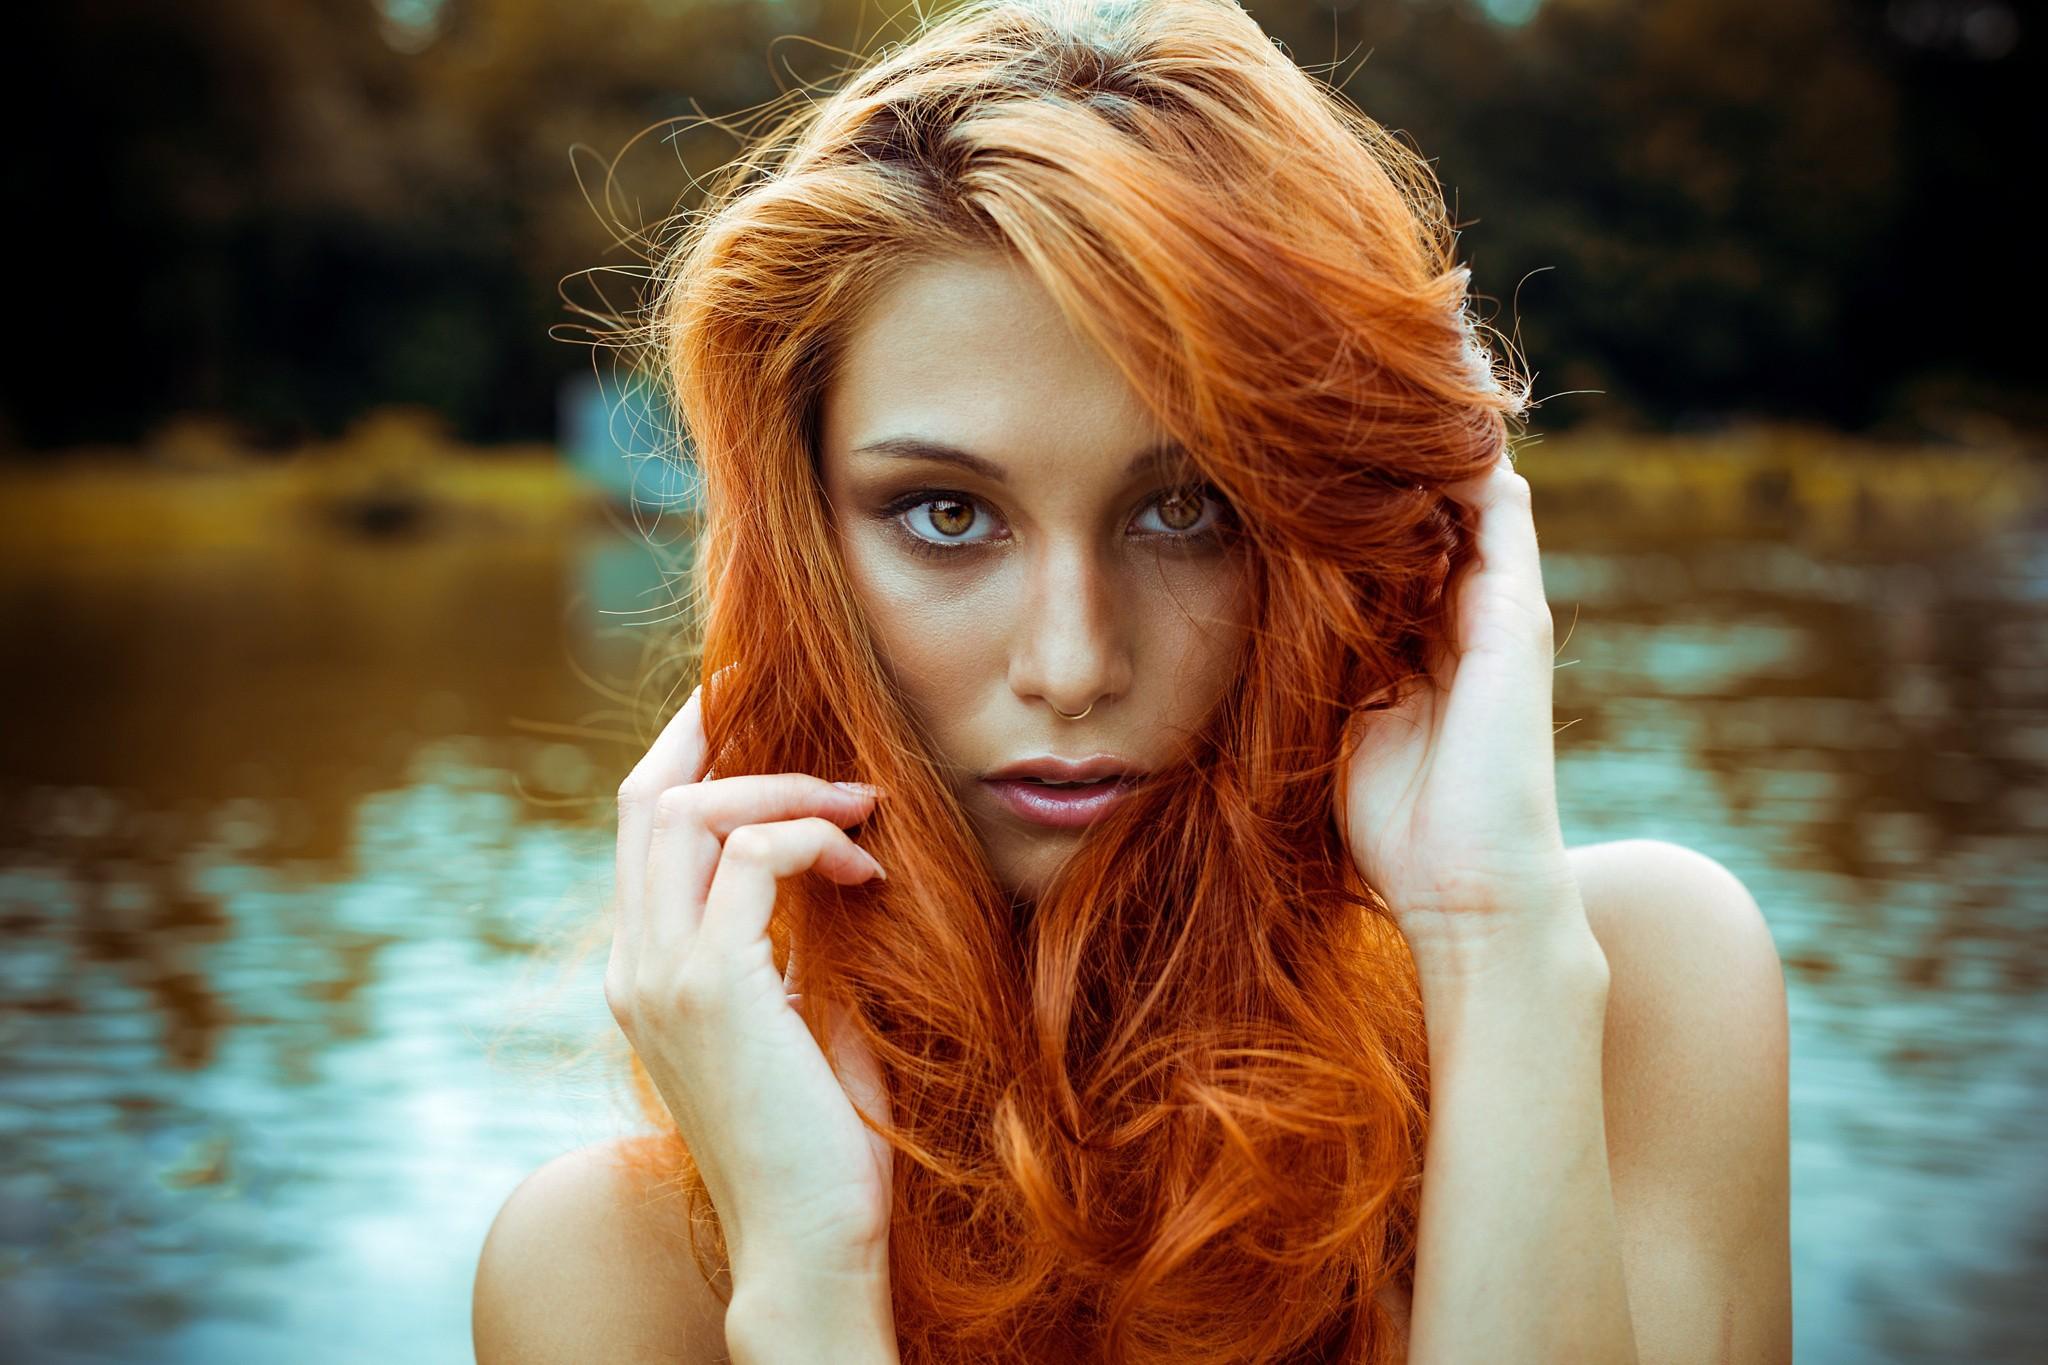 Wallpaper Face Women Model Nose Rings Long Hair: Victoria Ryzhevolosaya HD Desktop